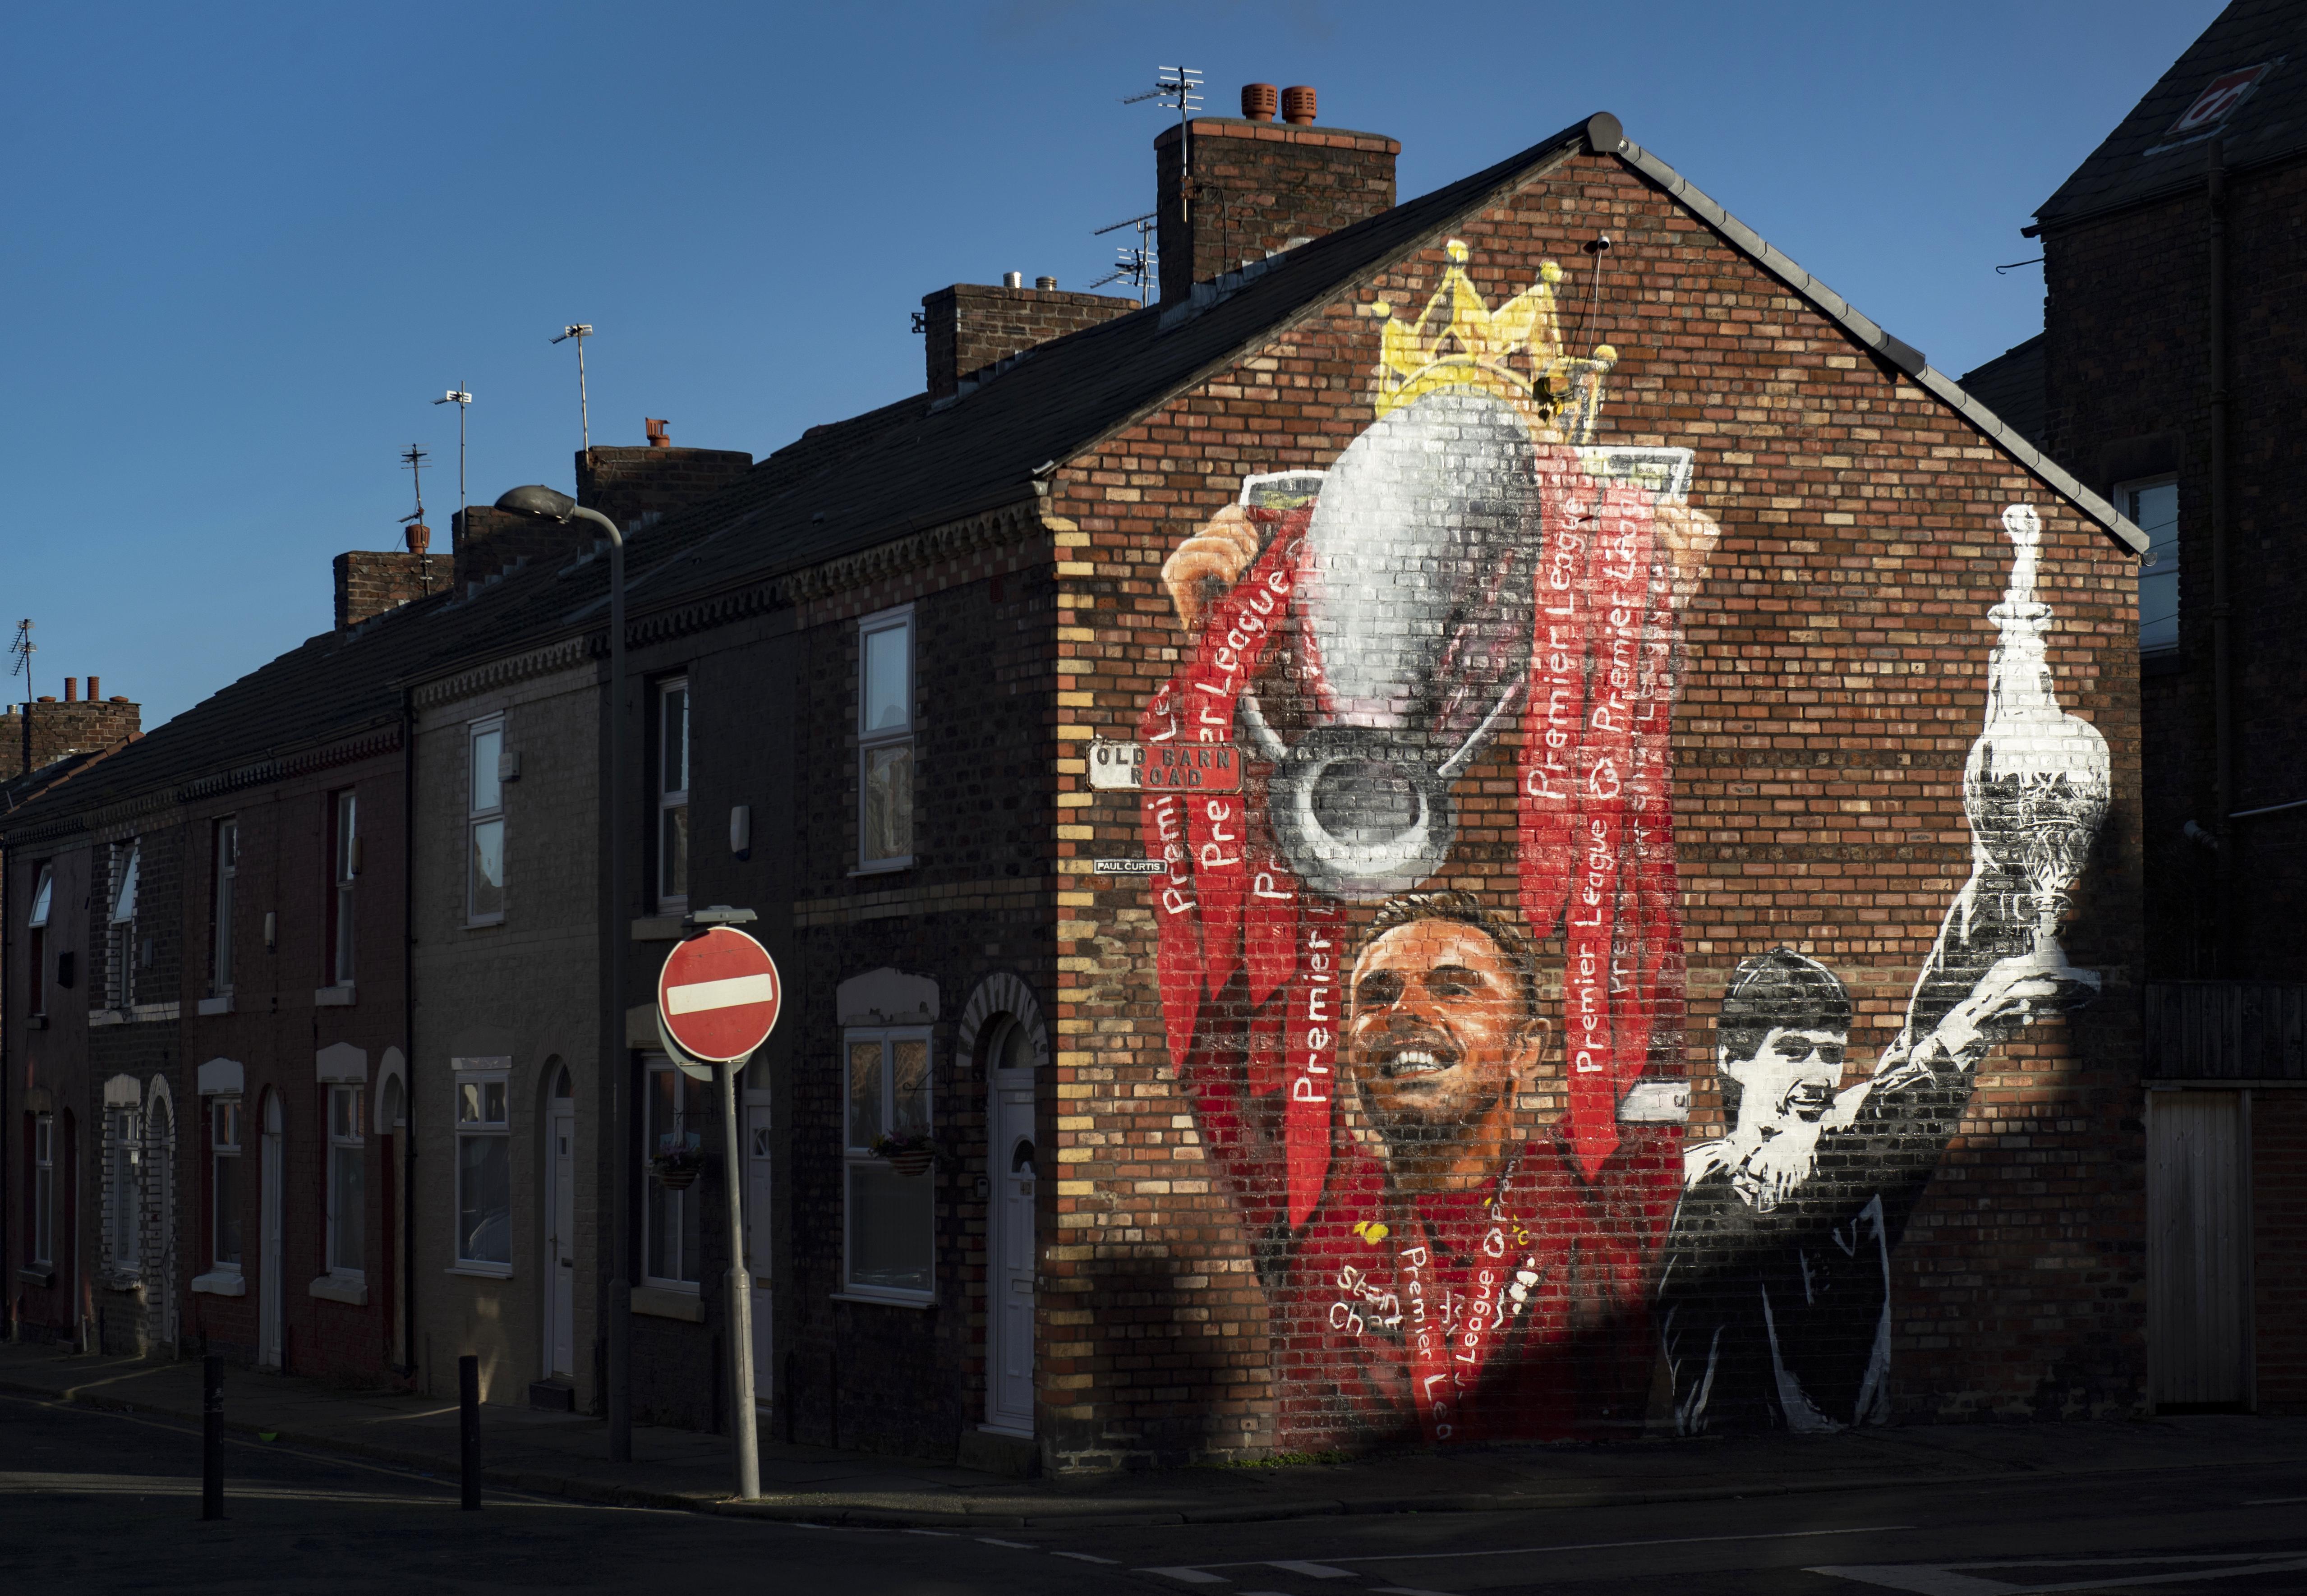 A Mural of Liverpool Captain Jordan Henderson Lifting the Premier League Trophy